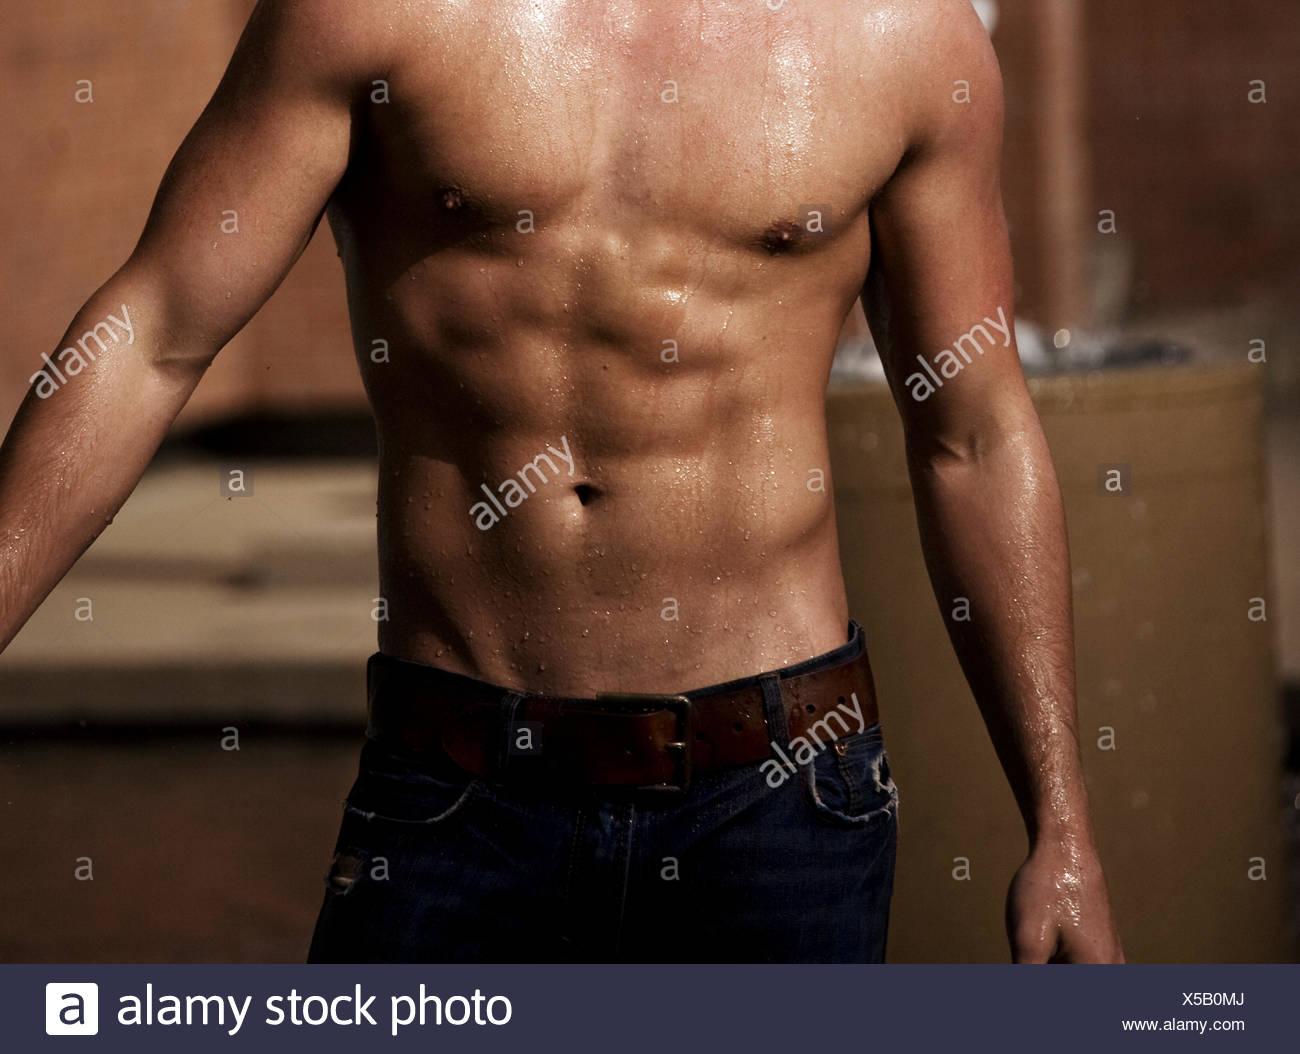 Wet muscles